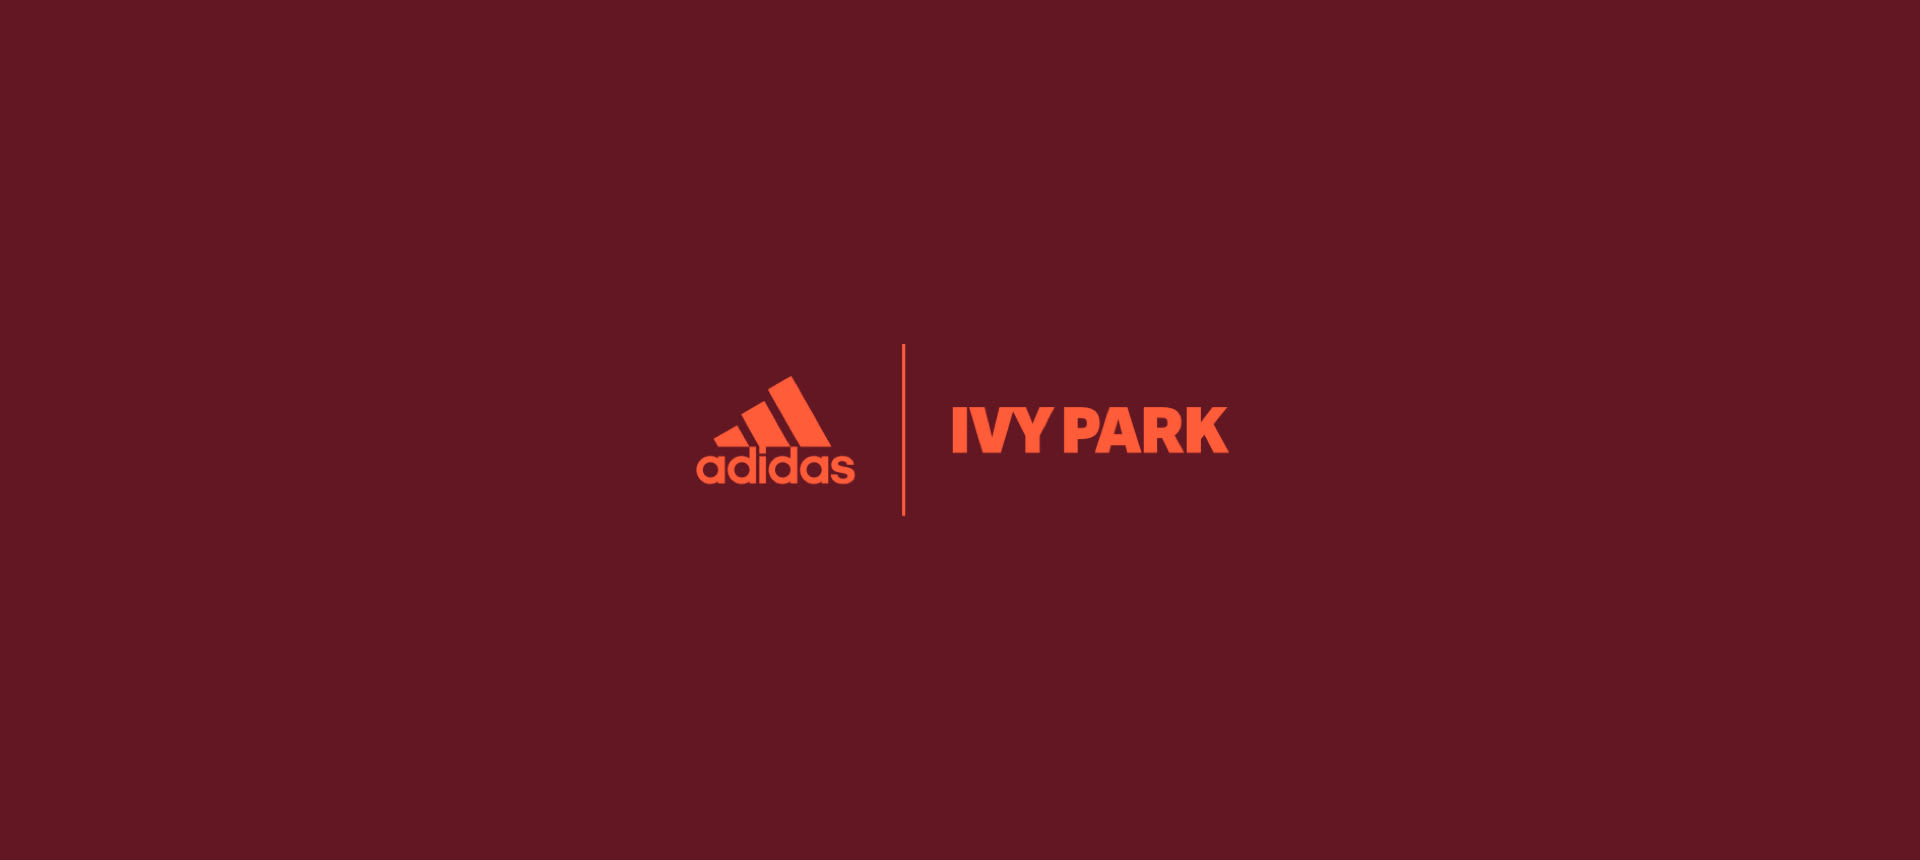 ivy park x adidas leggings